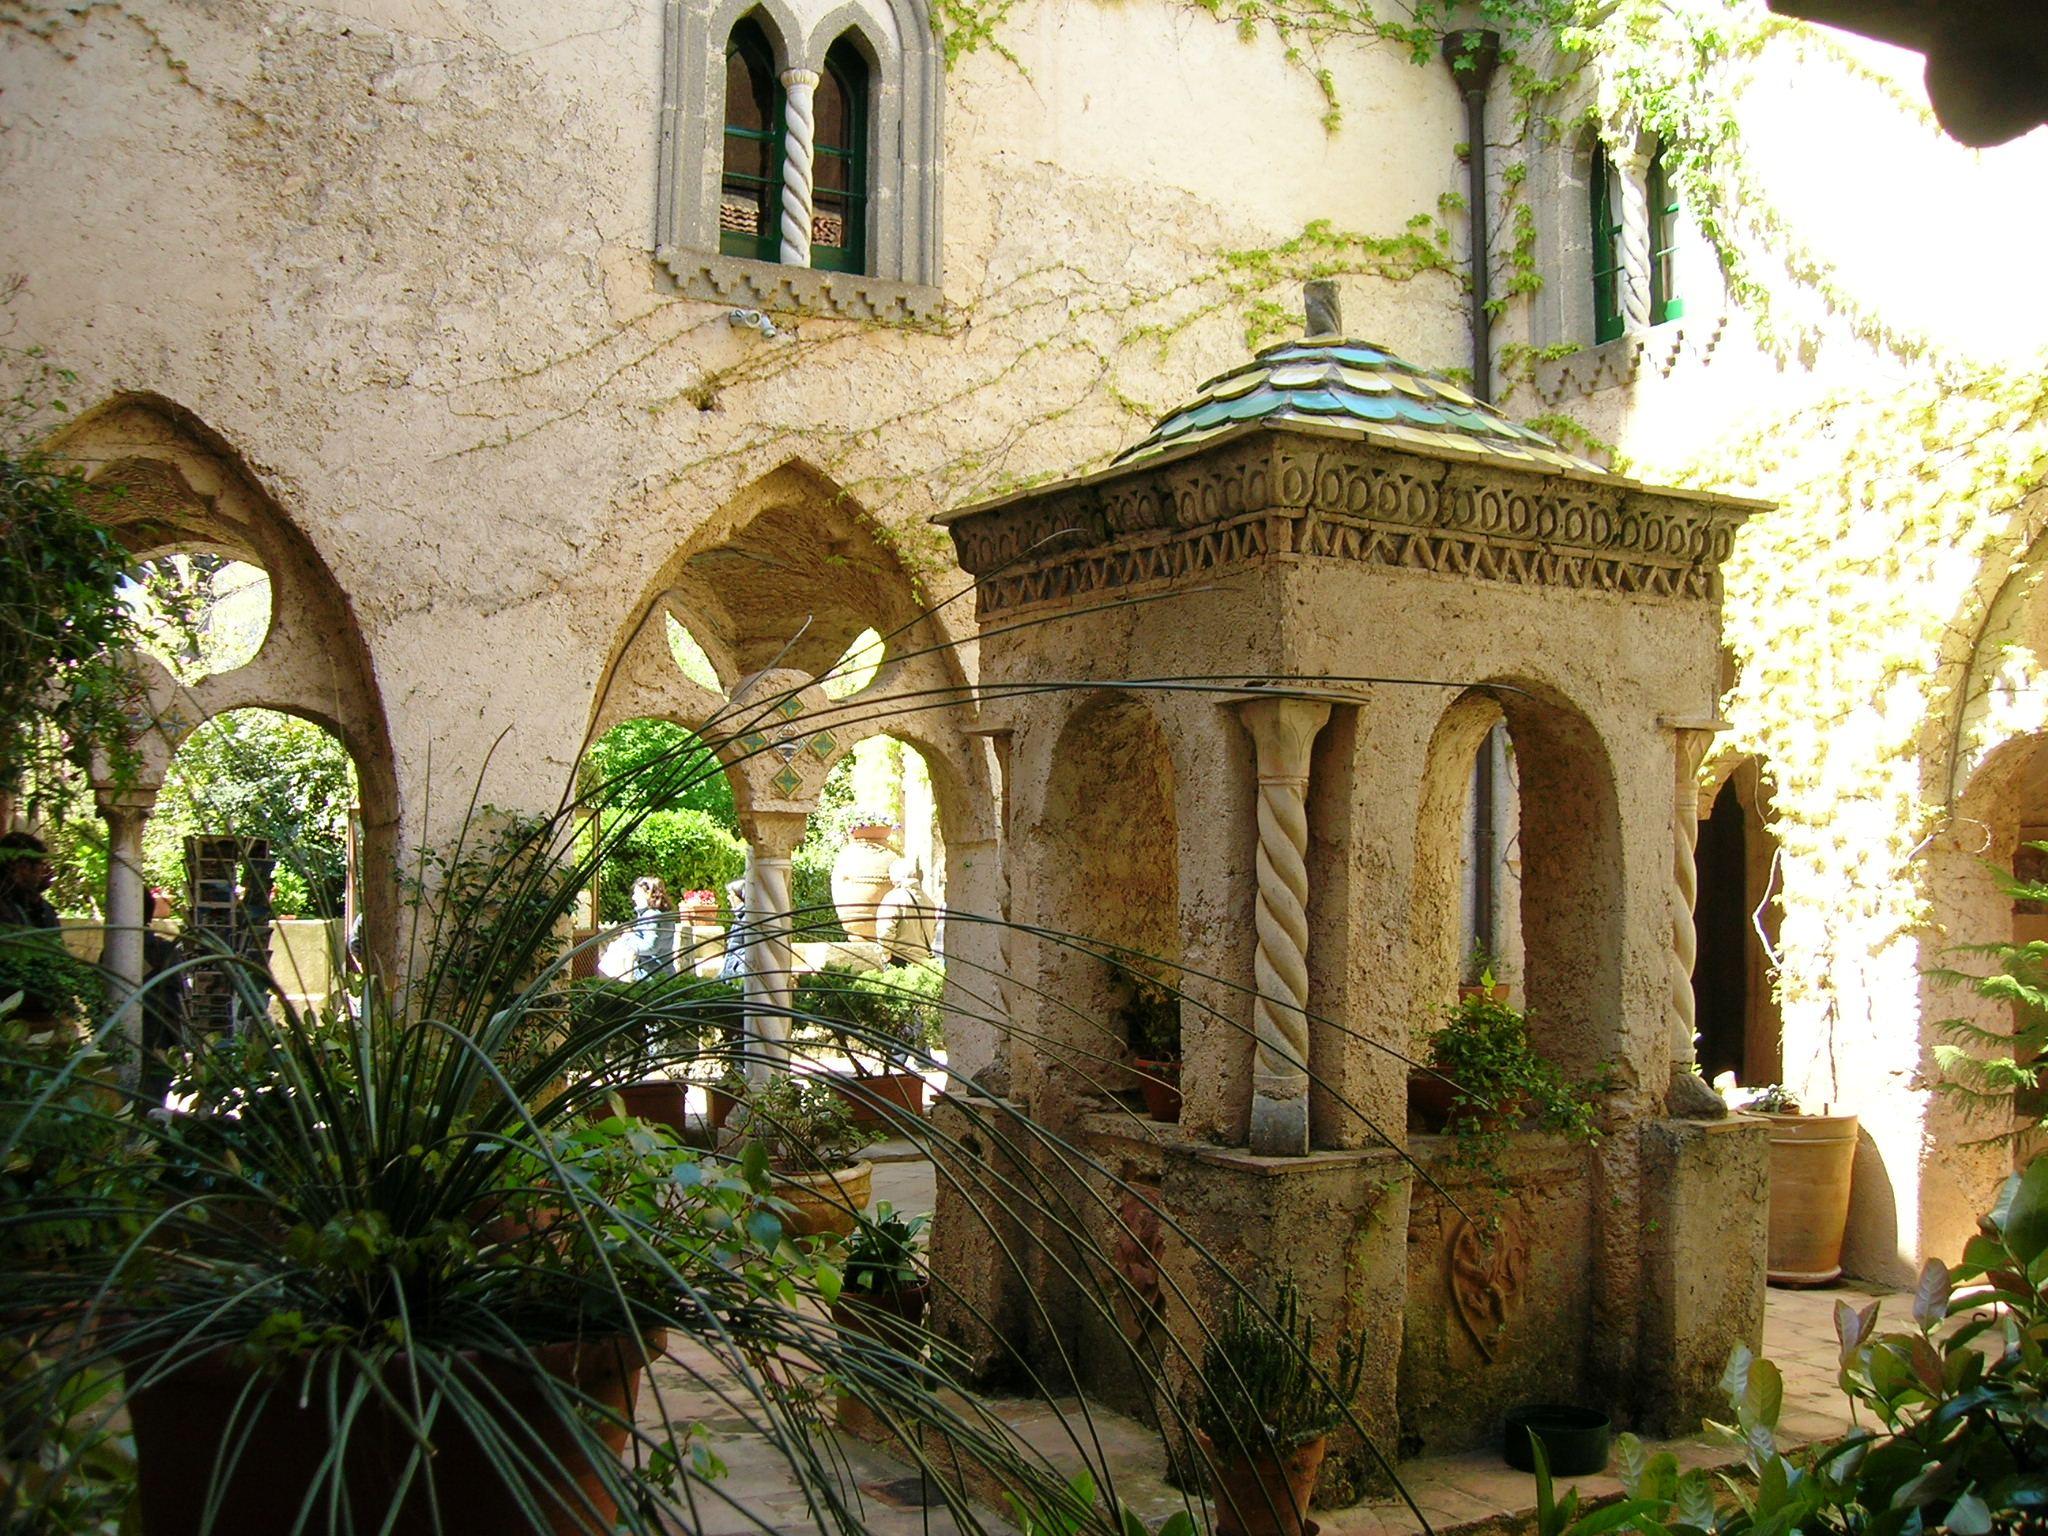 http://upload.wikimedia.org/wikipedia/commons/1/17/Villa_Cimbrone_Ravello_27.JPG